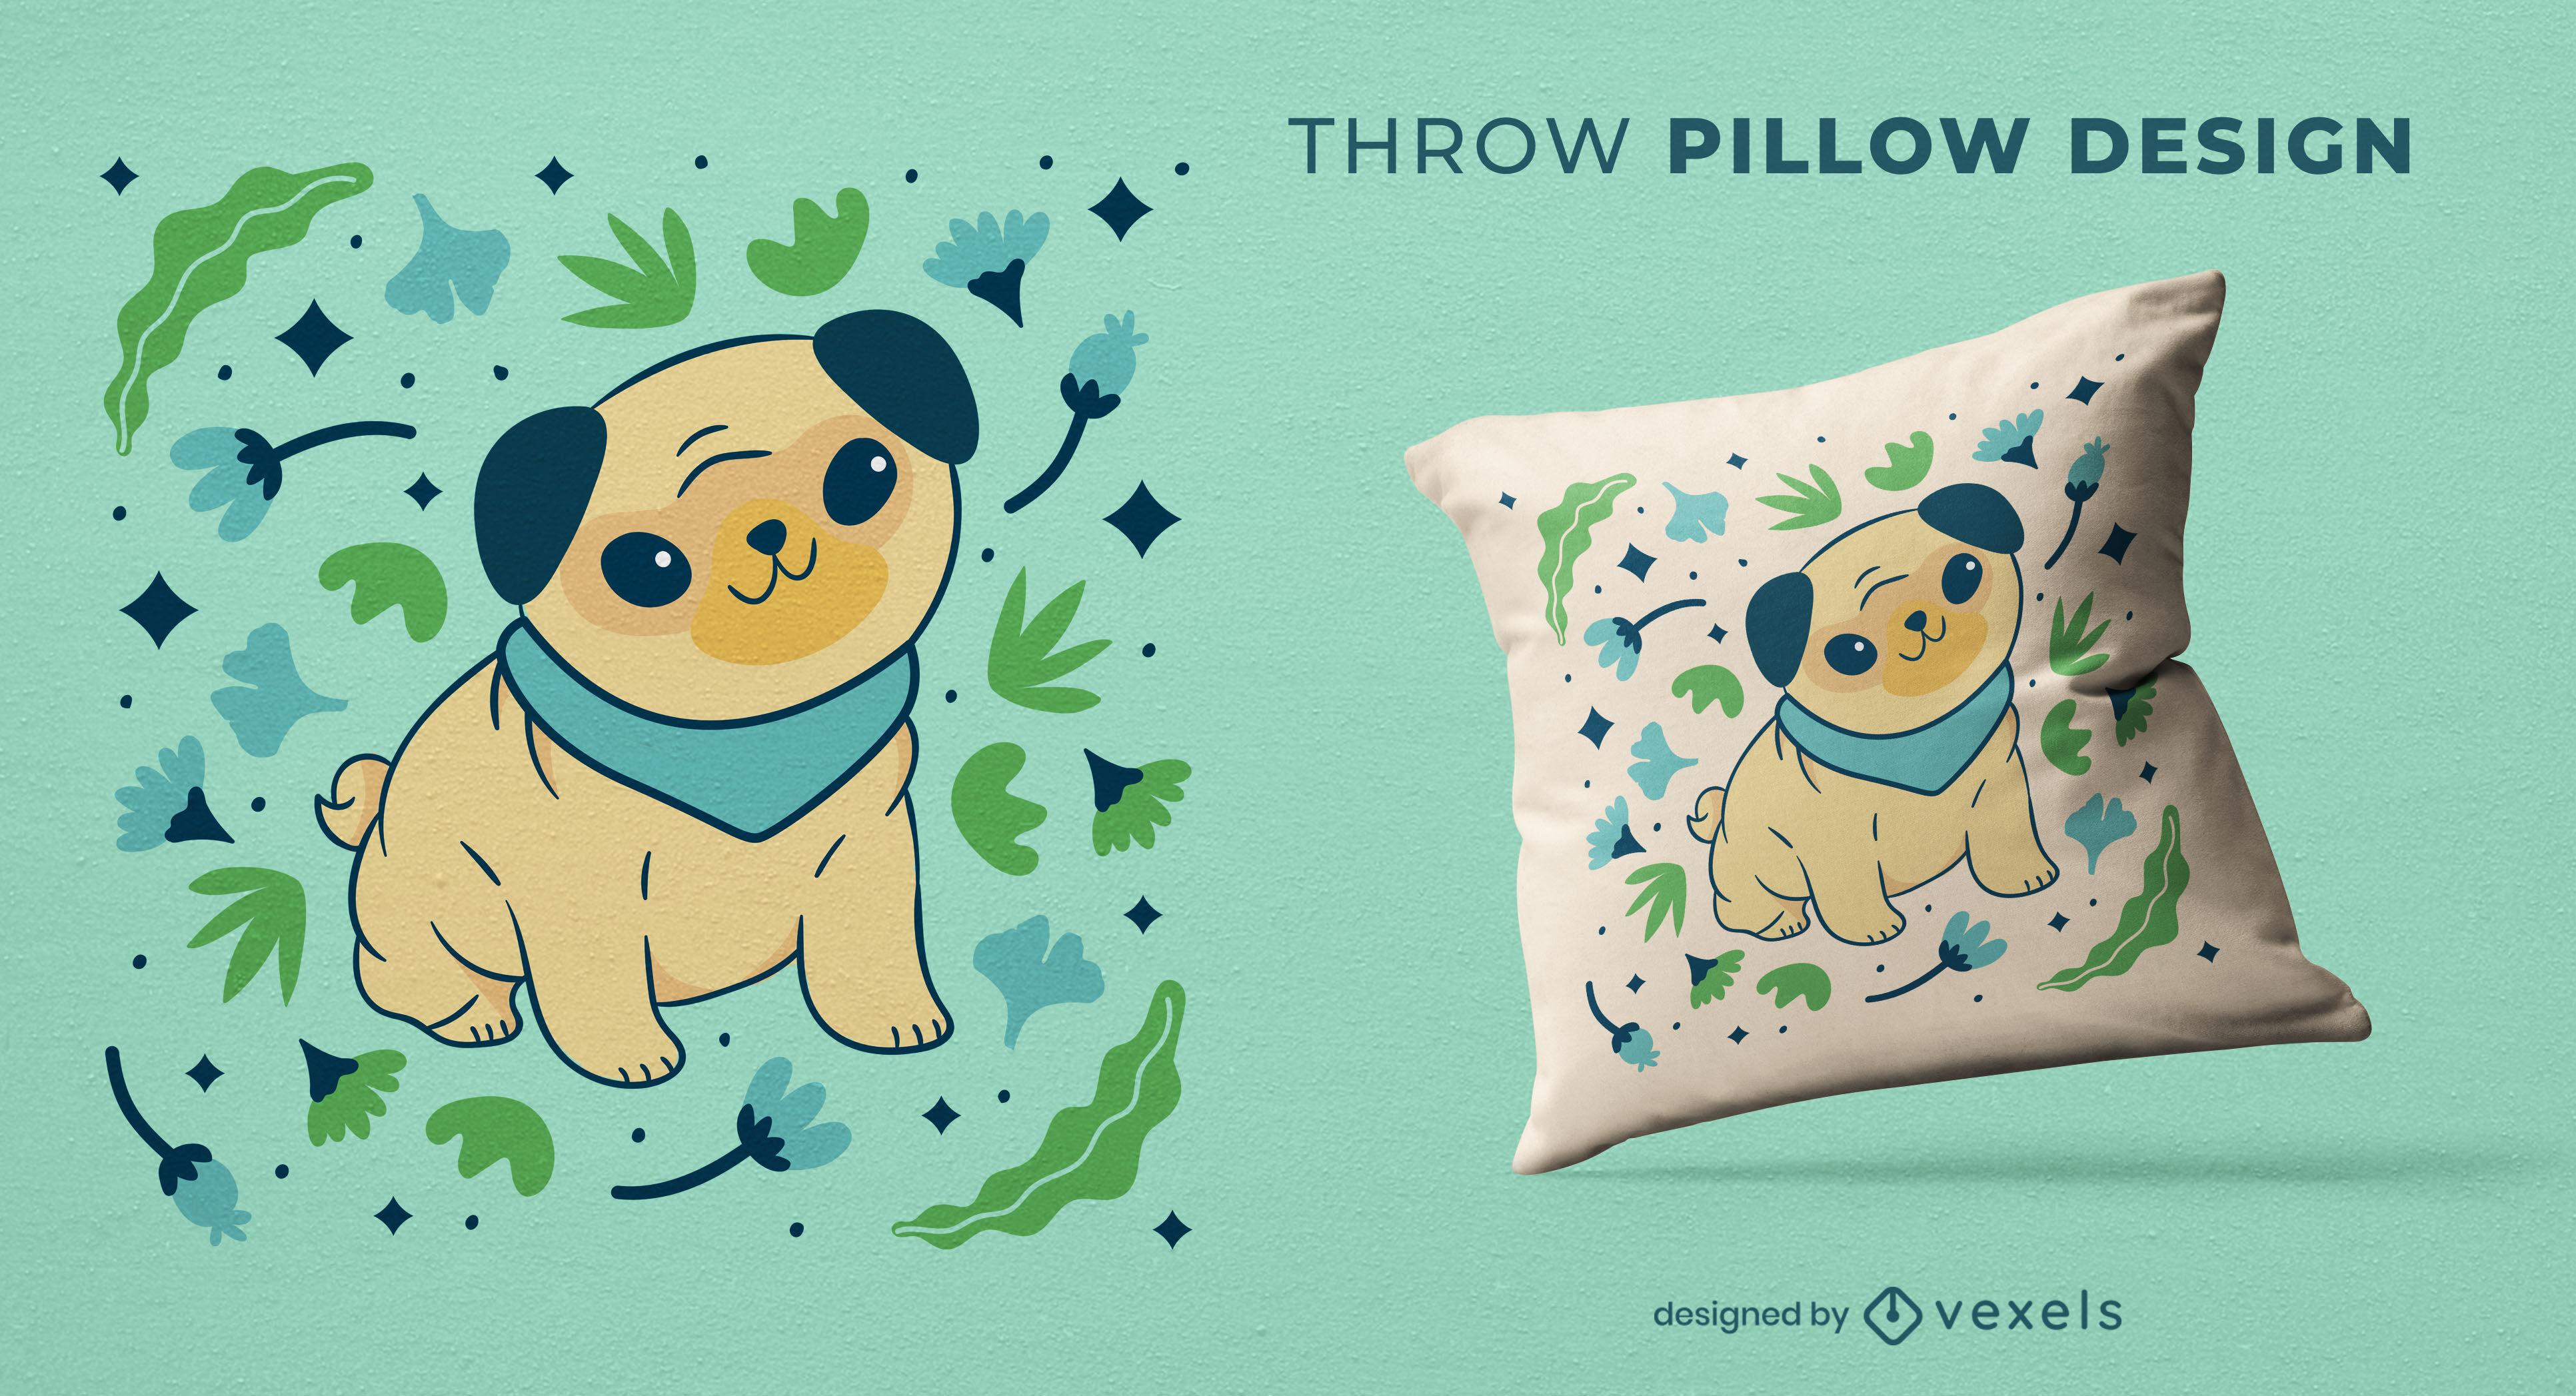 Diseño de almohada de tiro animal lindo perro pug